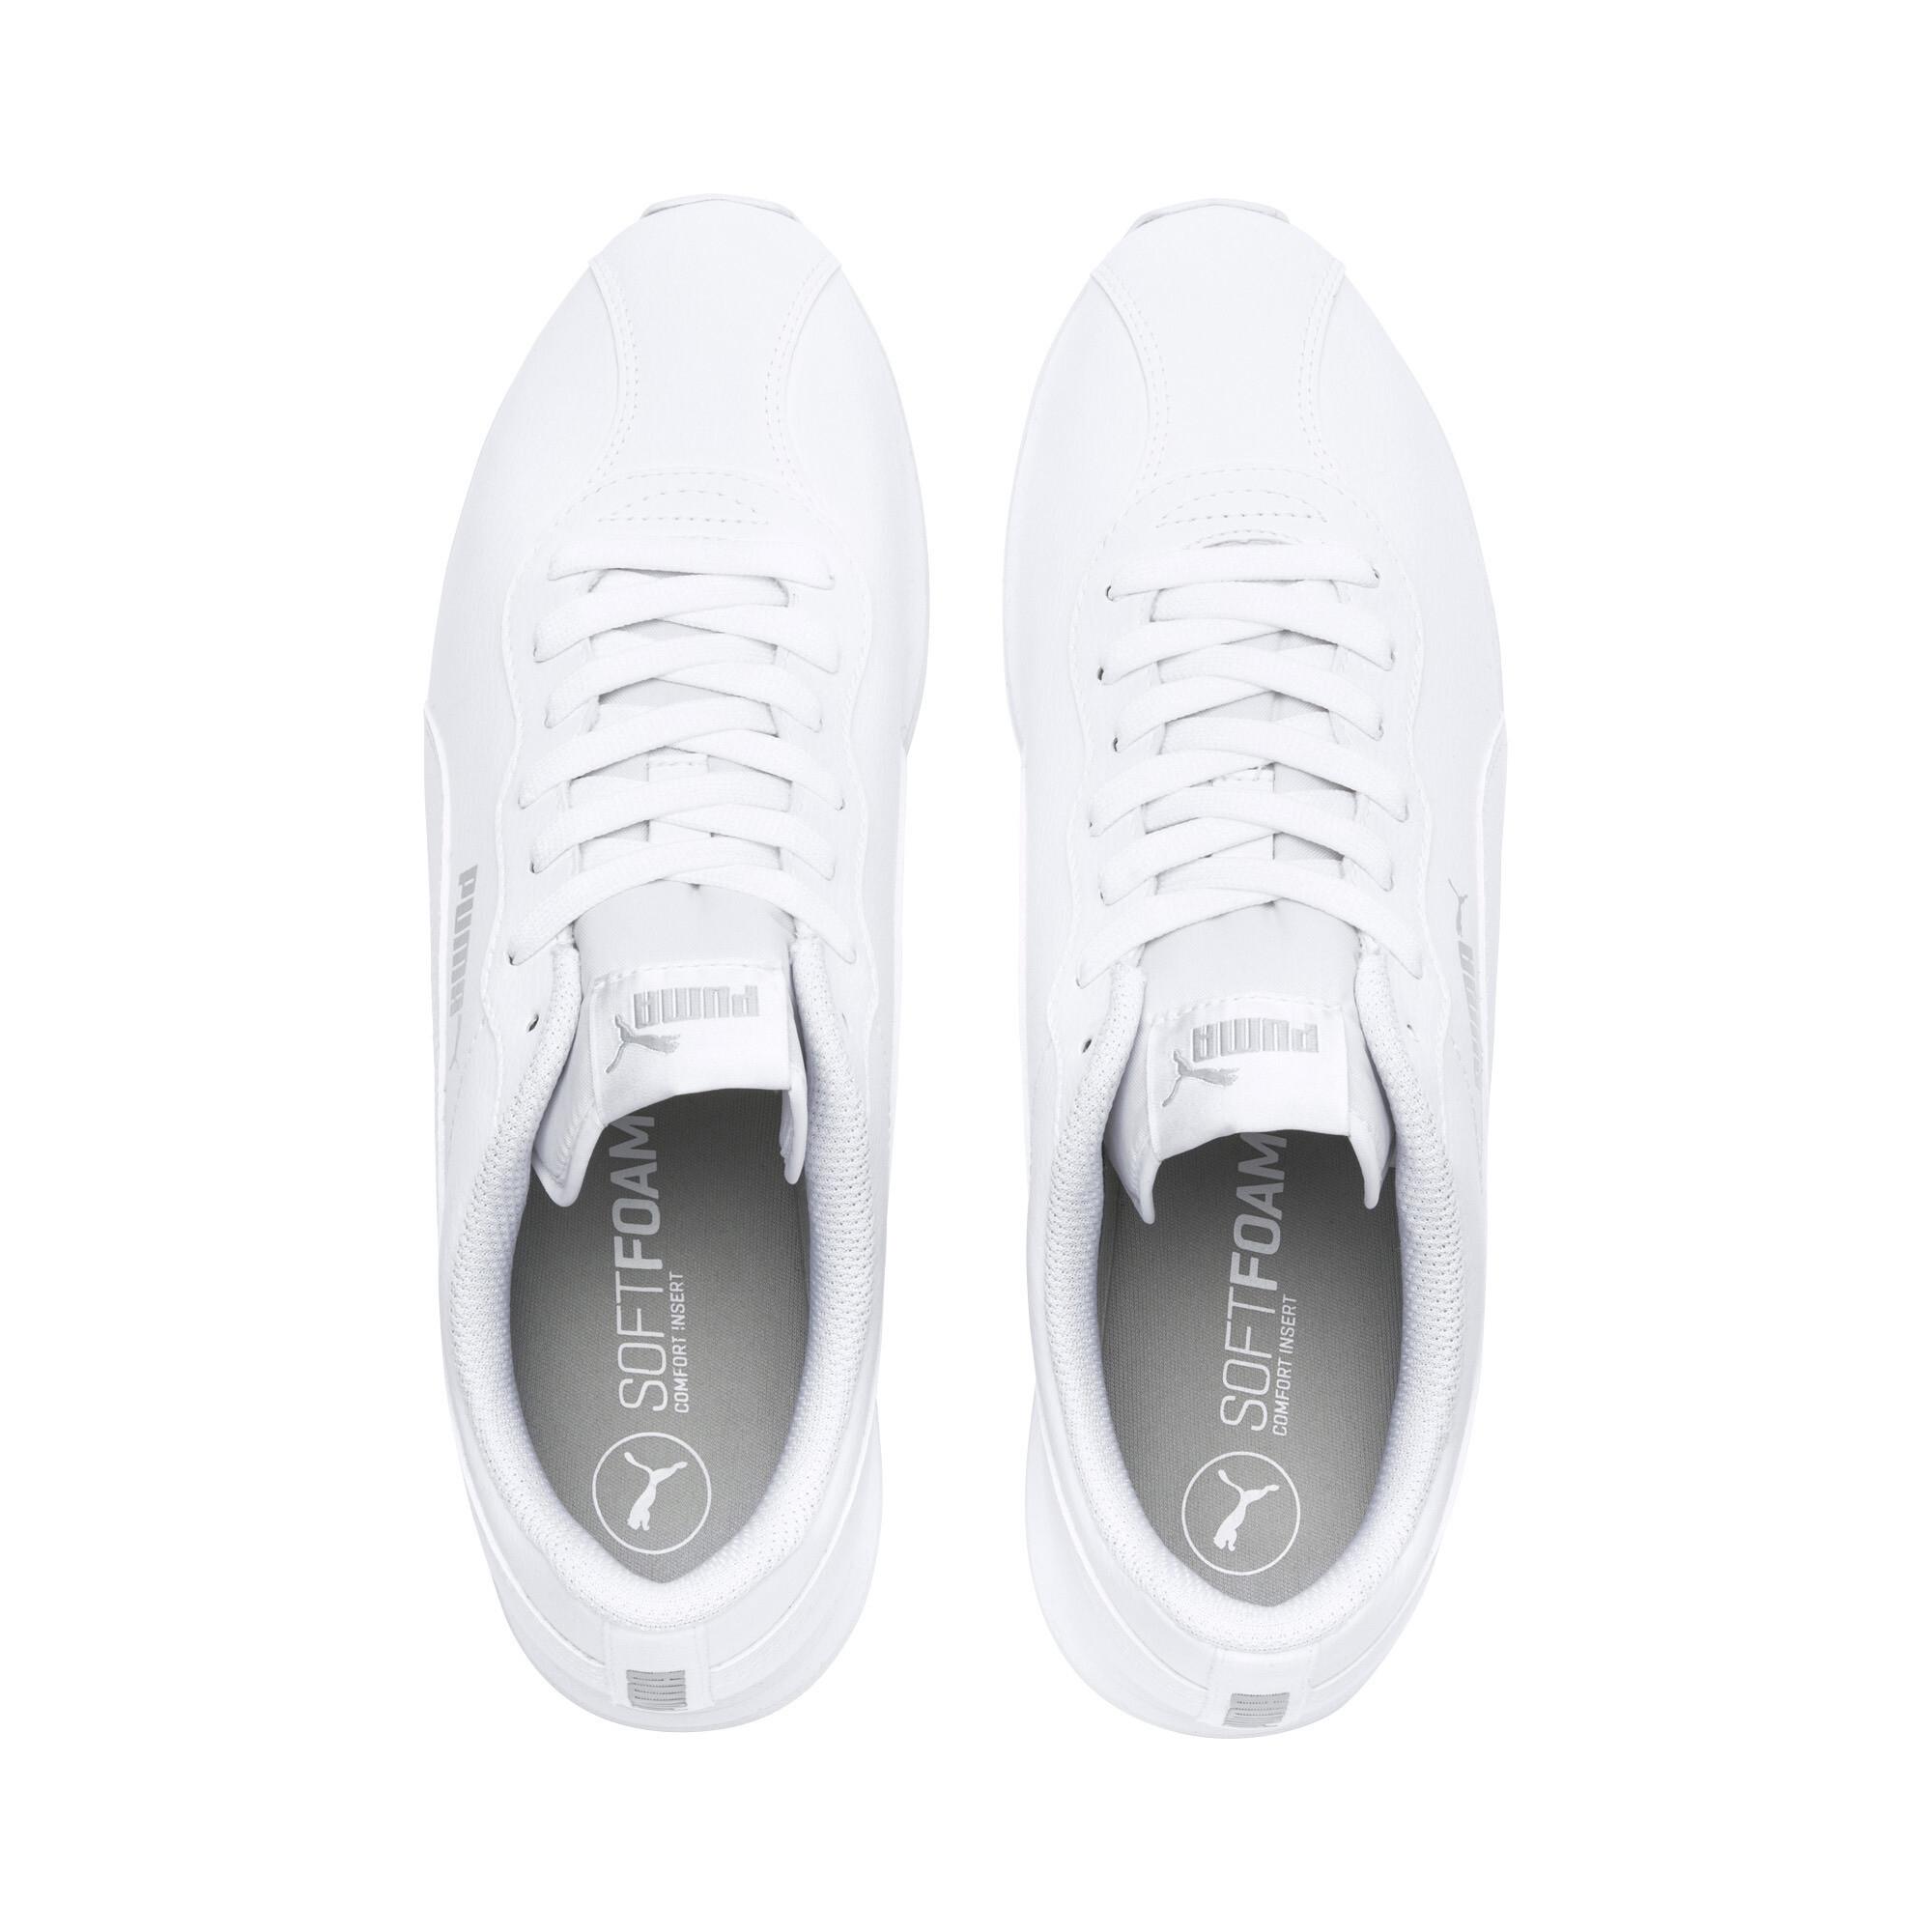 PUMA-Men-039-s-Turin-II-Sneakers thumbnail 13